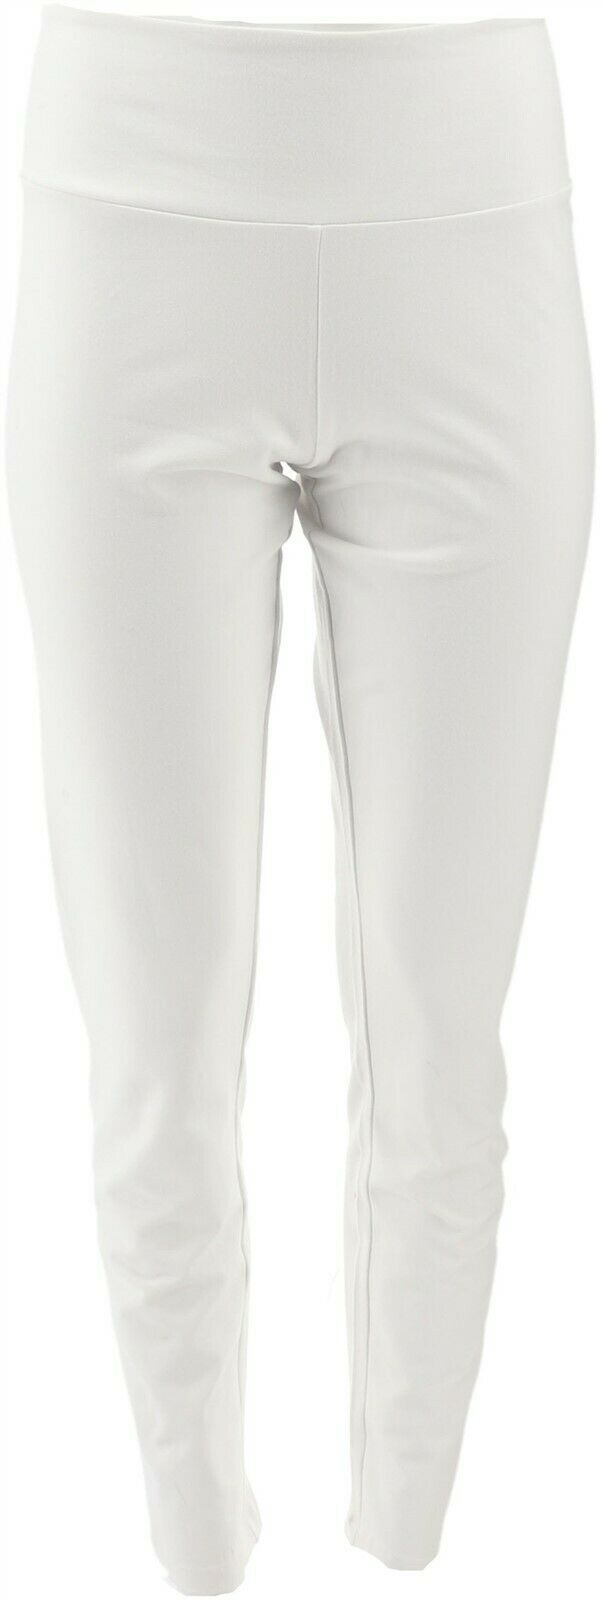 AnyBody Tall Cozy Knit Jogger Pants Seaming Heather Indigo S NEW A349795